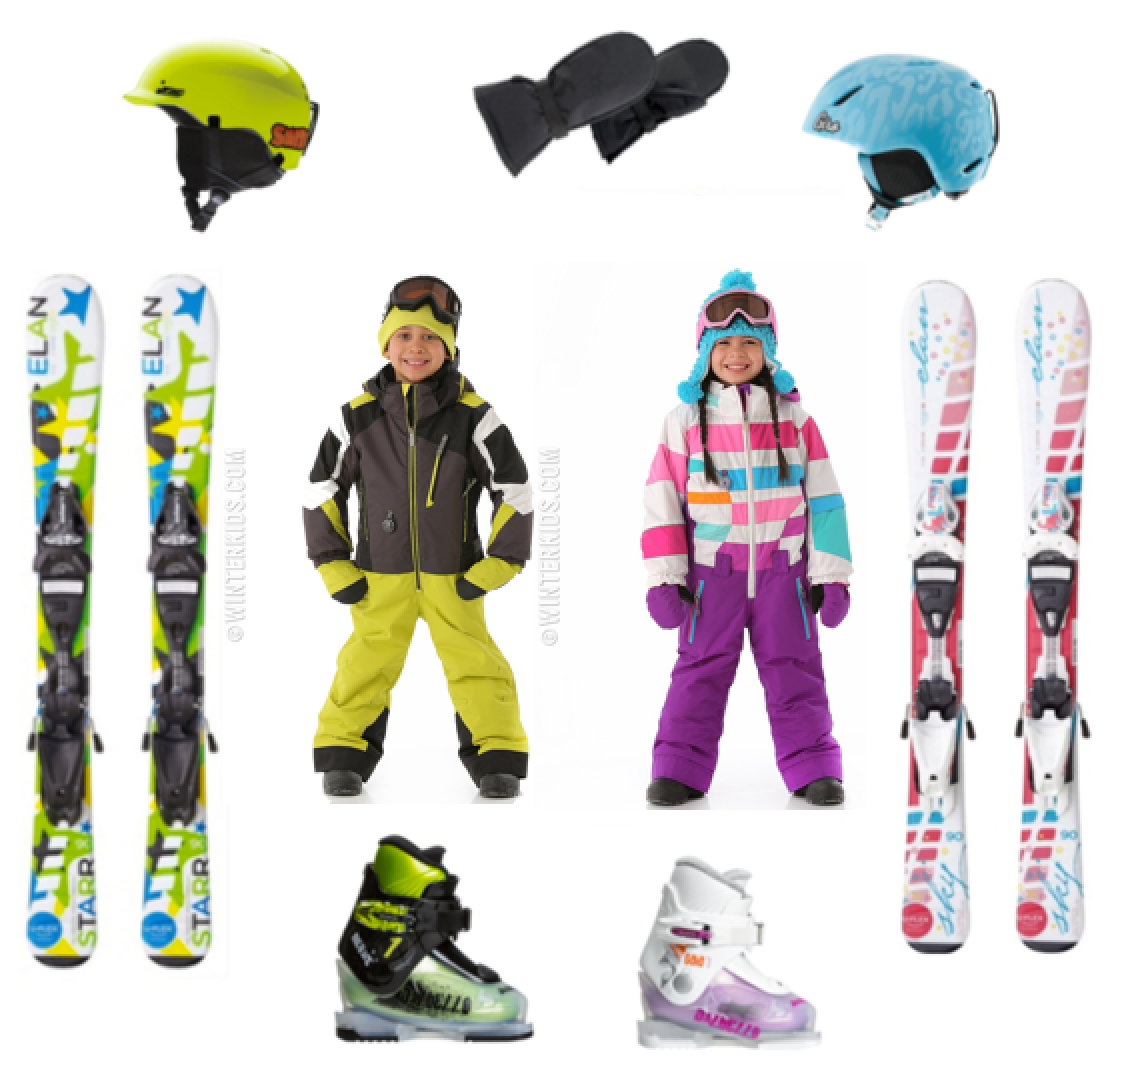 kids ski gear 2014 - 2015